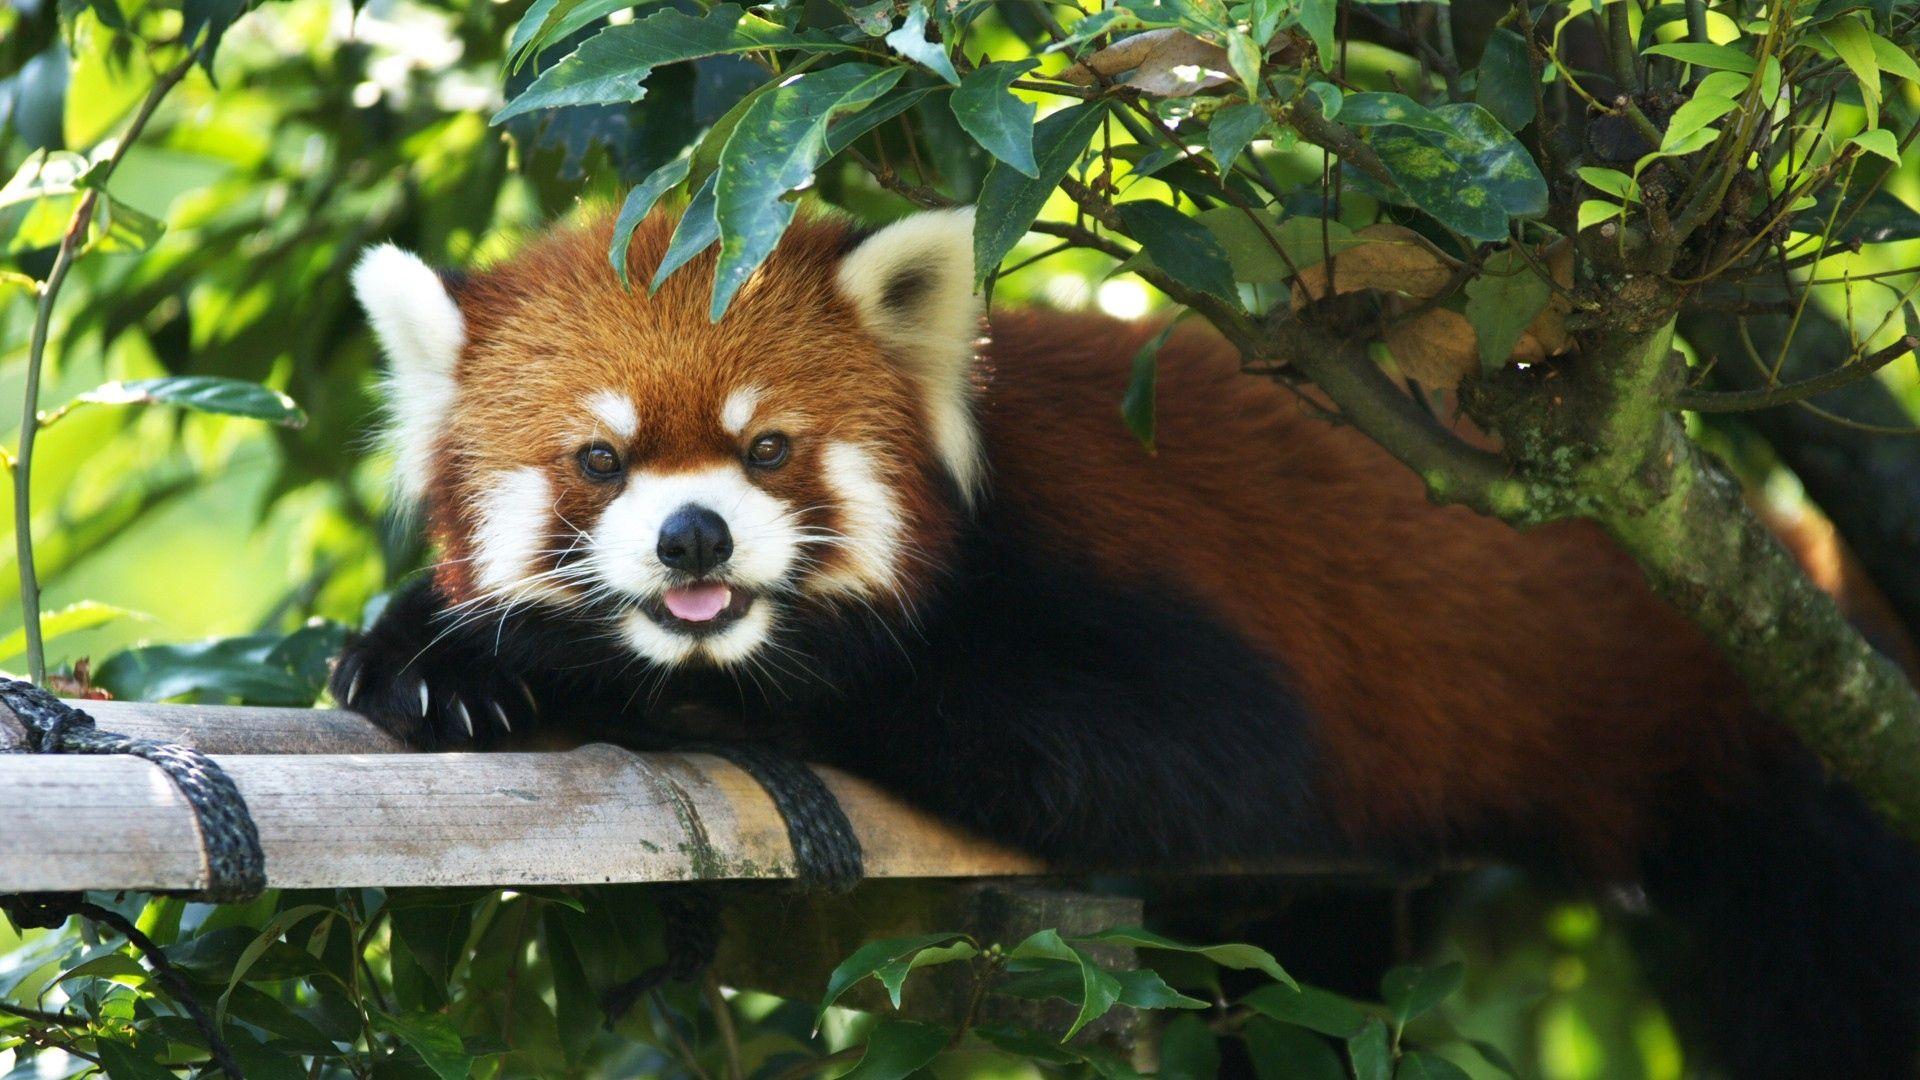 Download Wallpaper 1920x1080 Red Panda Lie Down Tree Branch Full Hd 1080p Hd Background Red Panda Panda Wallpapers Red Panda Images